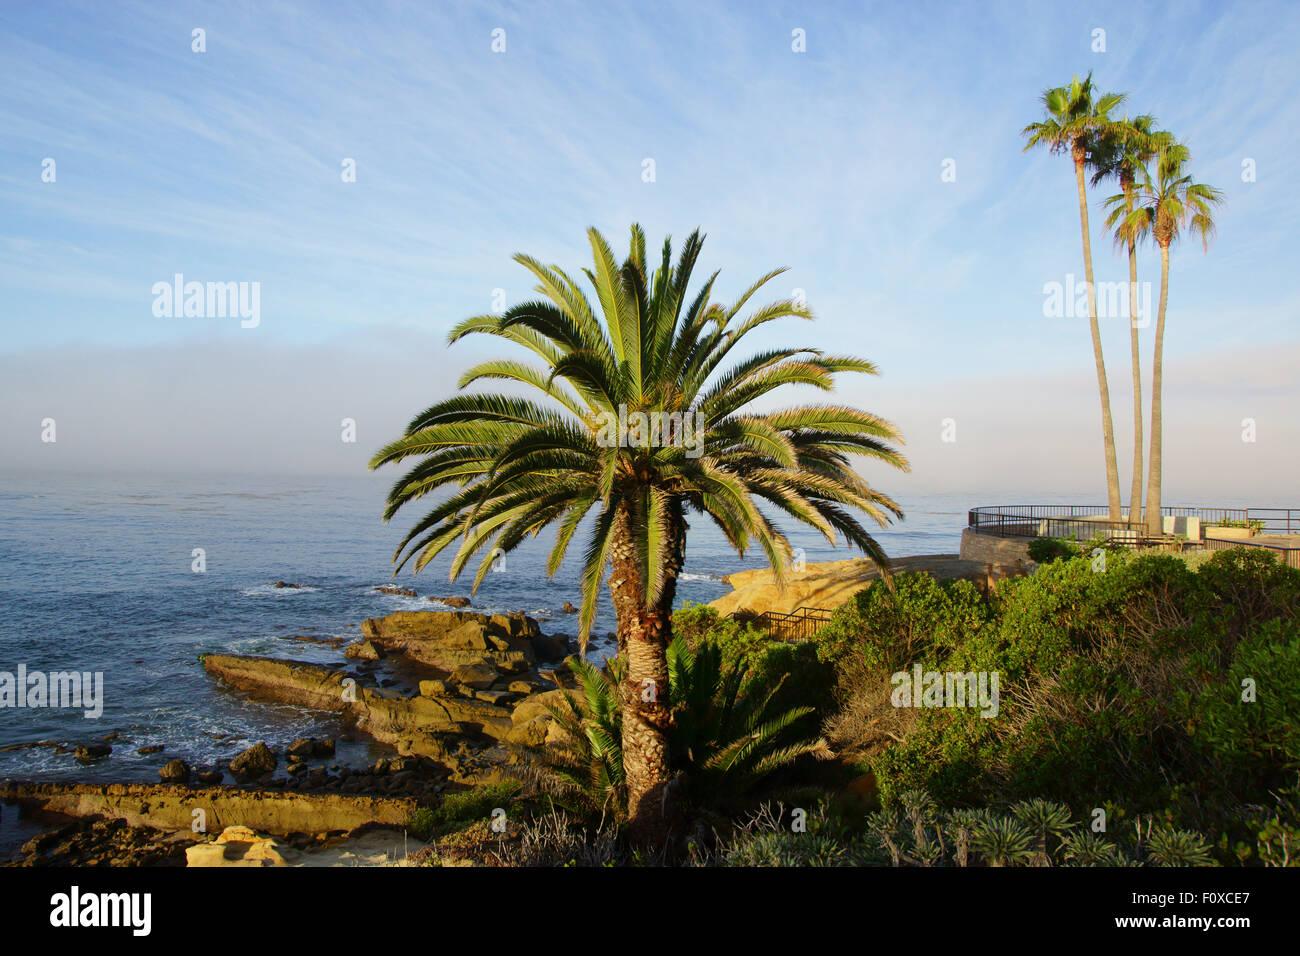 California Beach Palm Trees At Coastal Park And Pacific Ocean